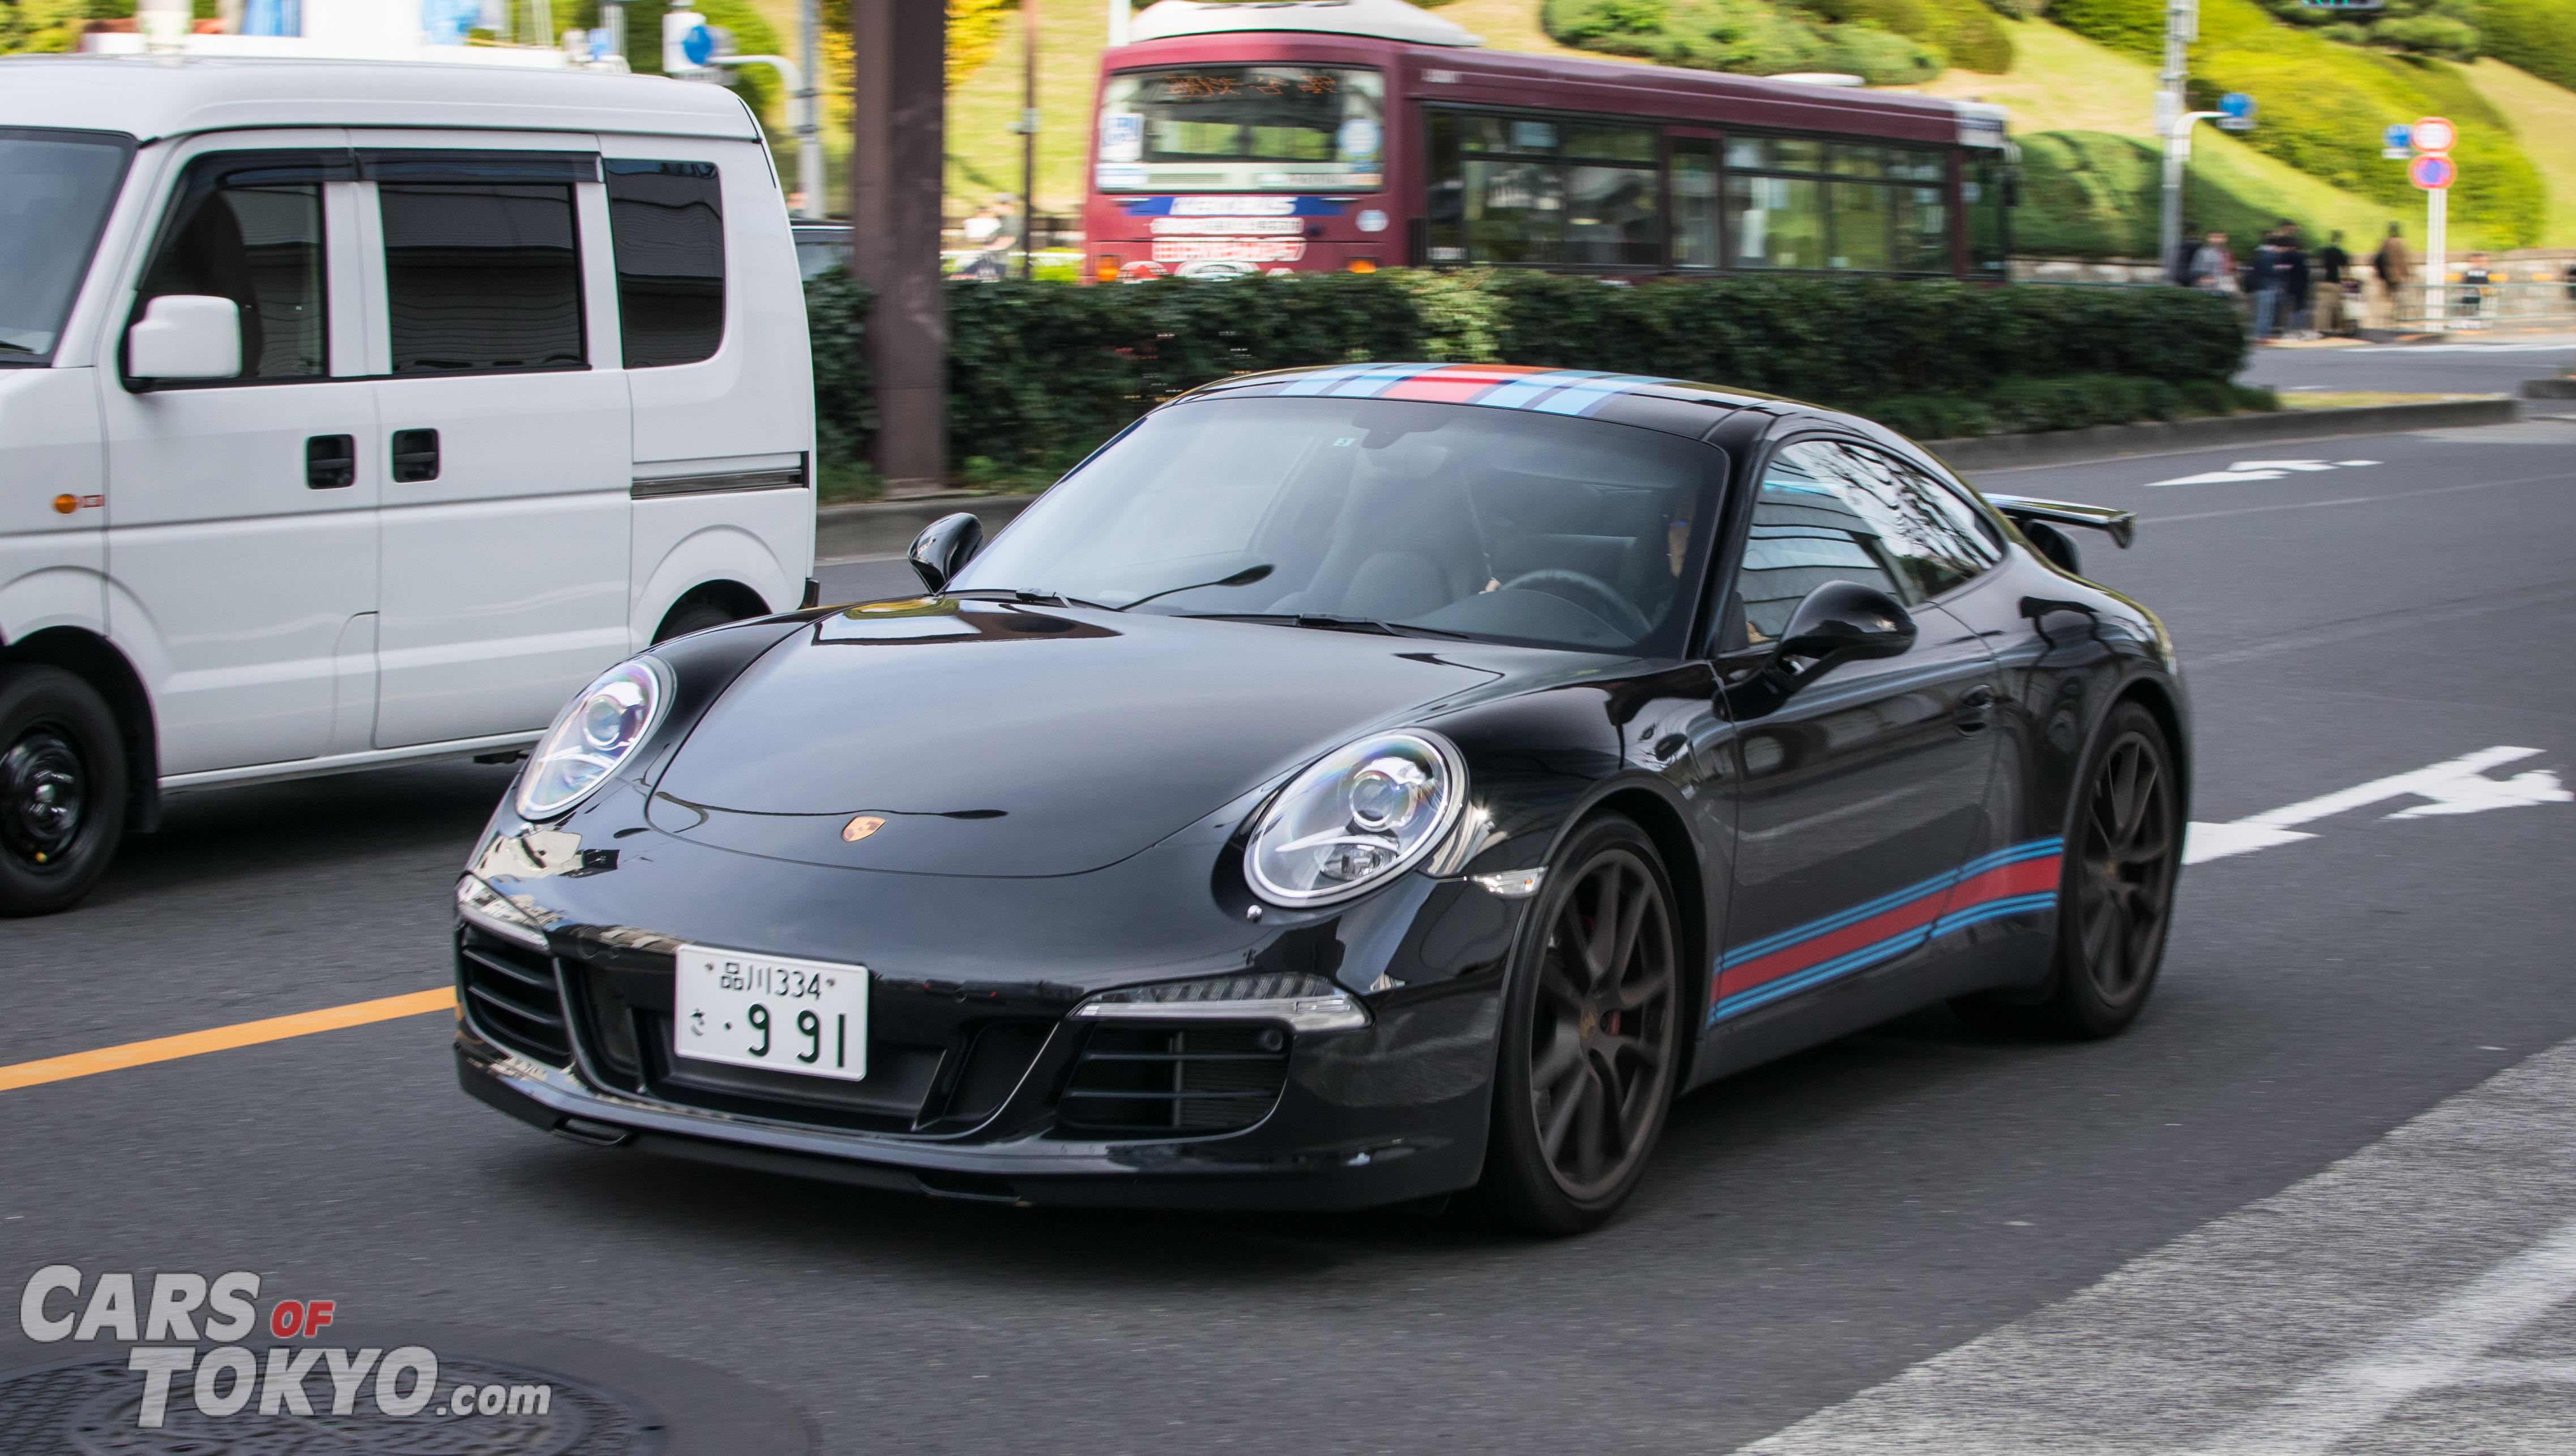 Cars of Tokyo Porsche 911 Martini